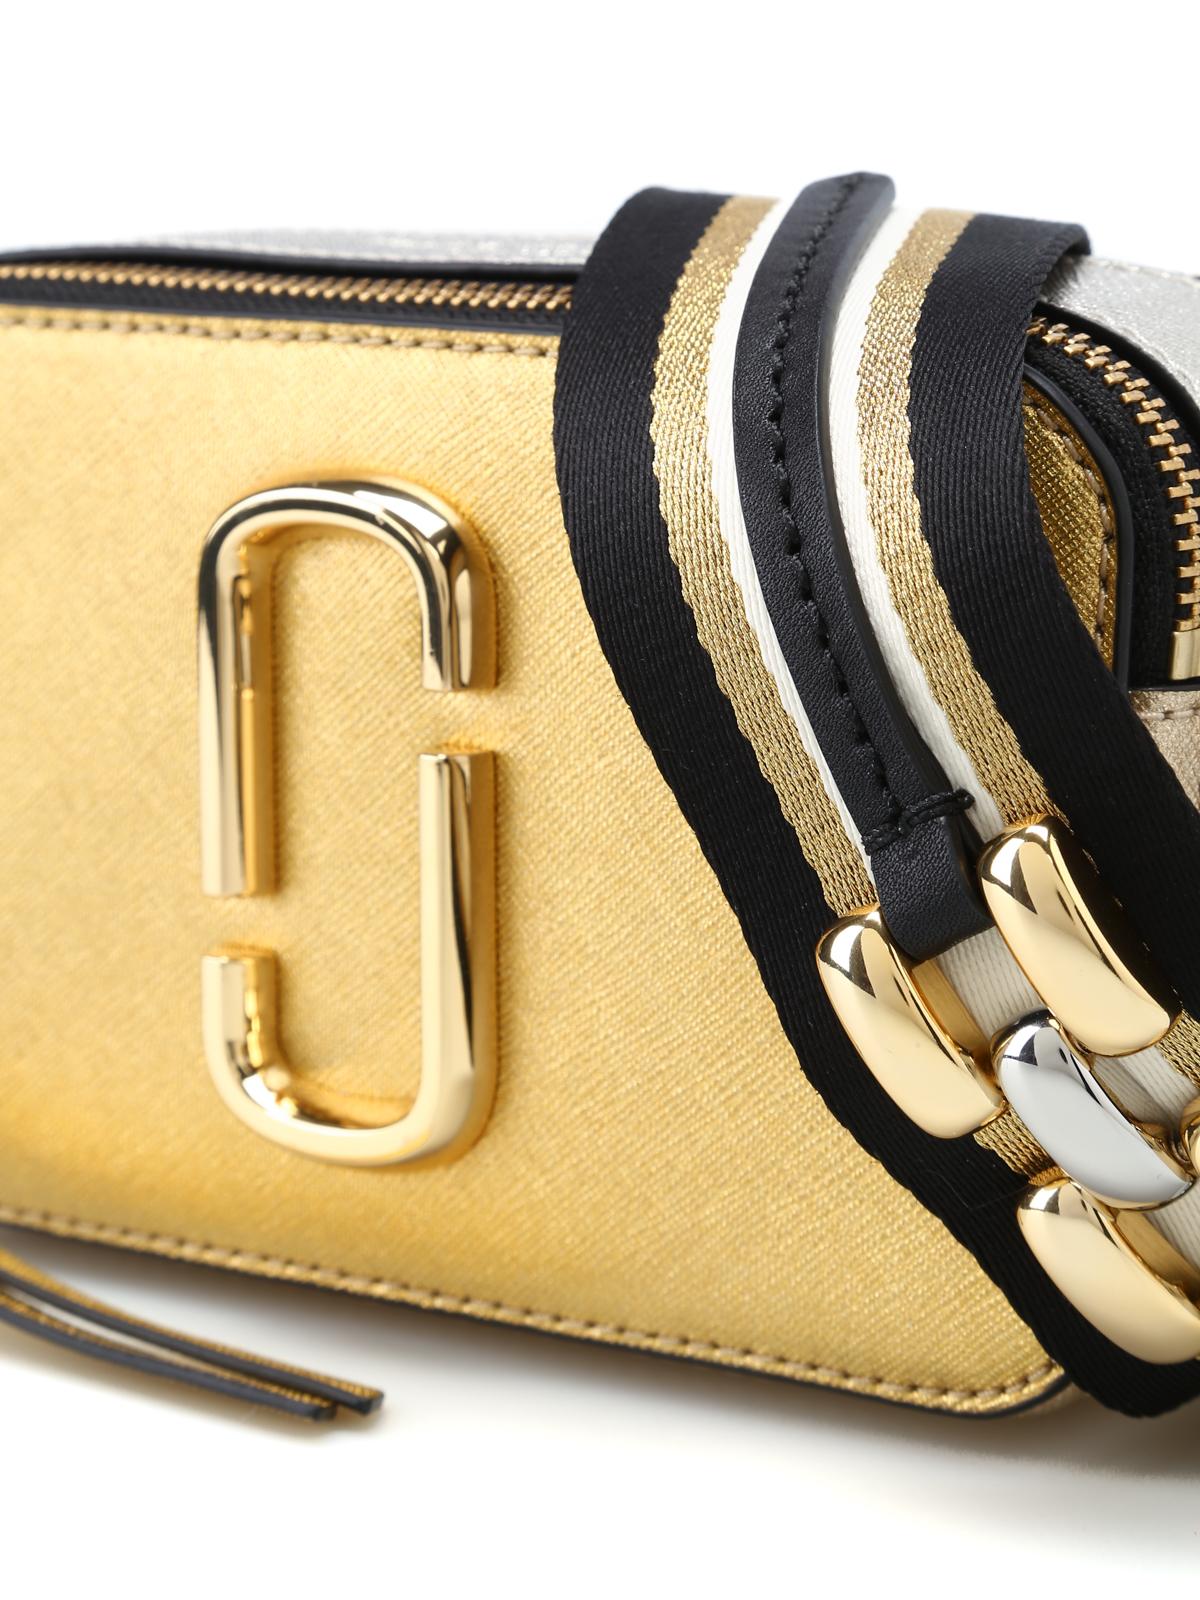 53edcc4dc34 Marc Jacobs - Snapshot metallic leather small bag - cross body bags ...